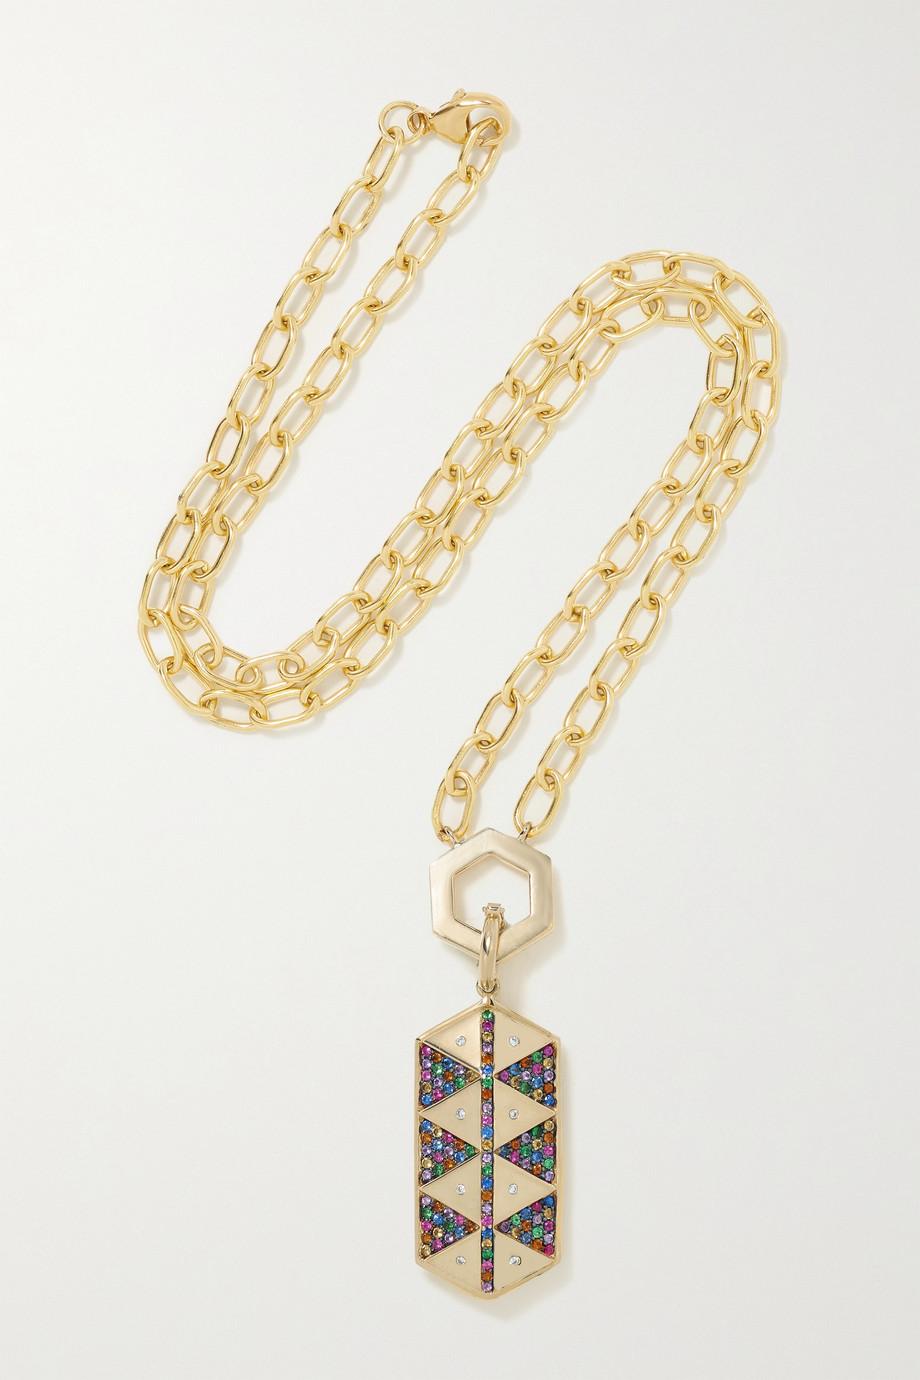 Harwell Godfrey 18-karat gold multi-stone necklace